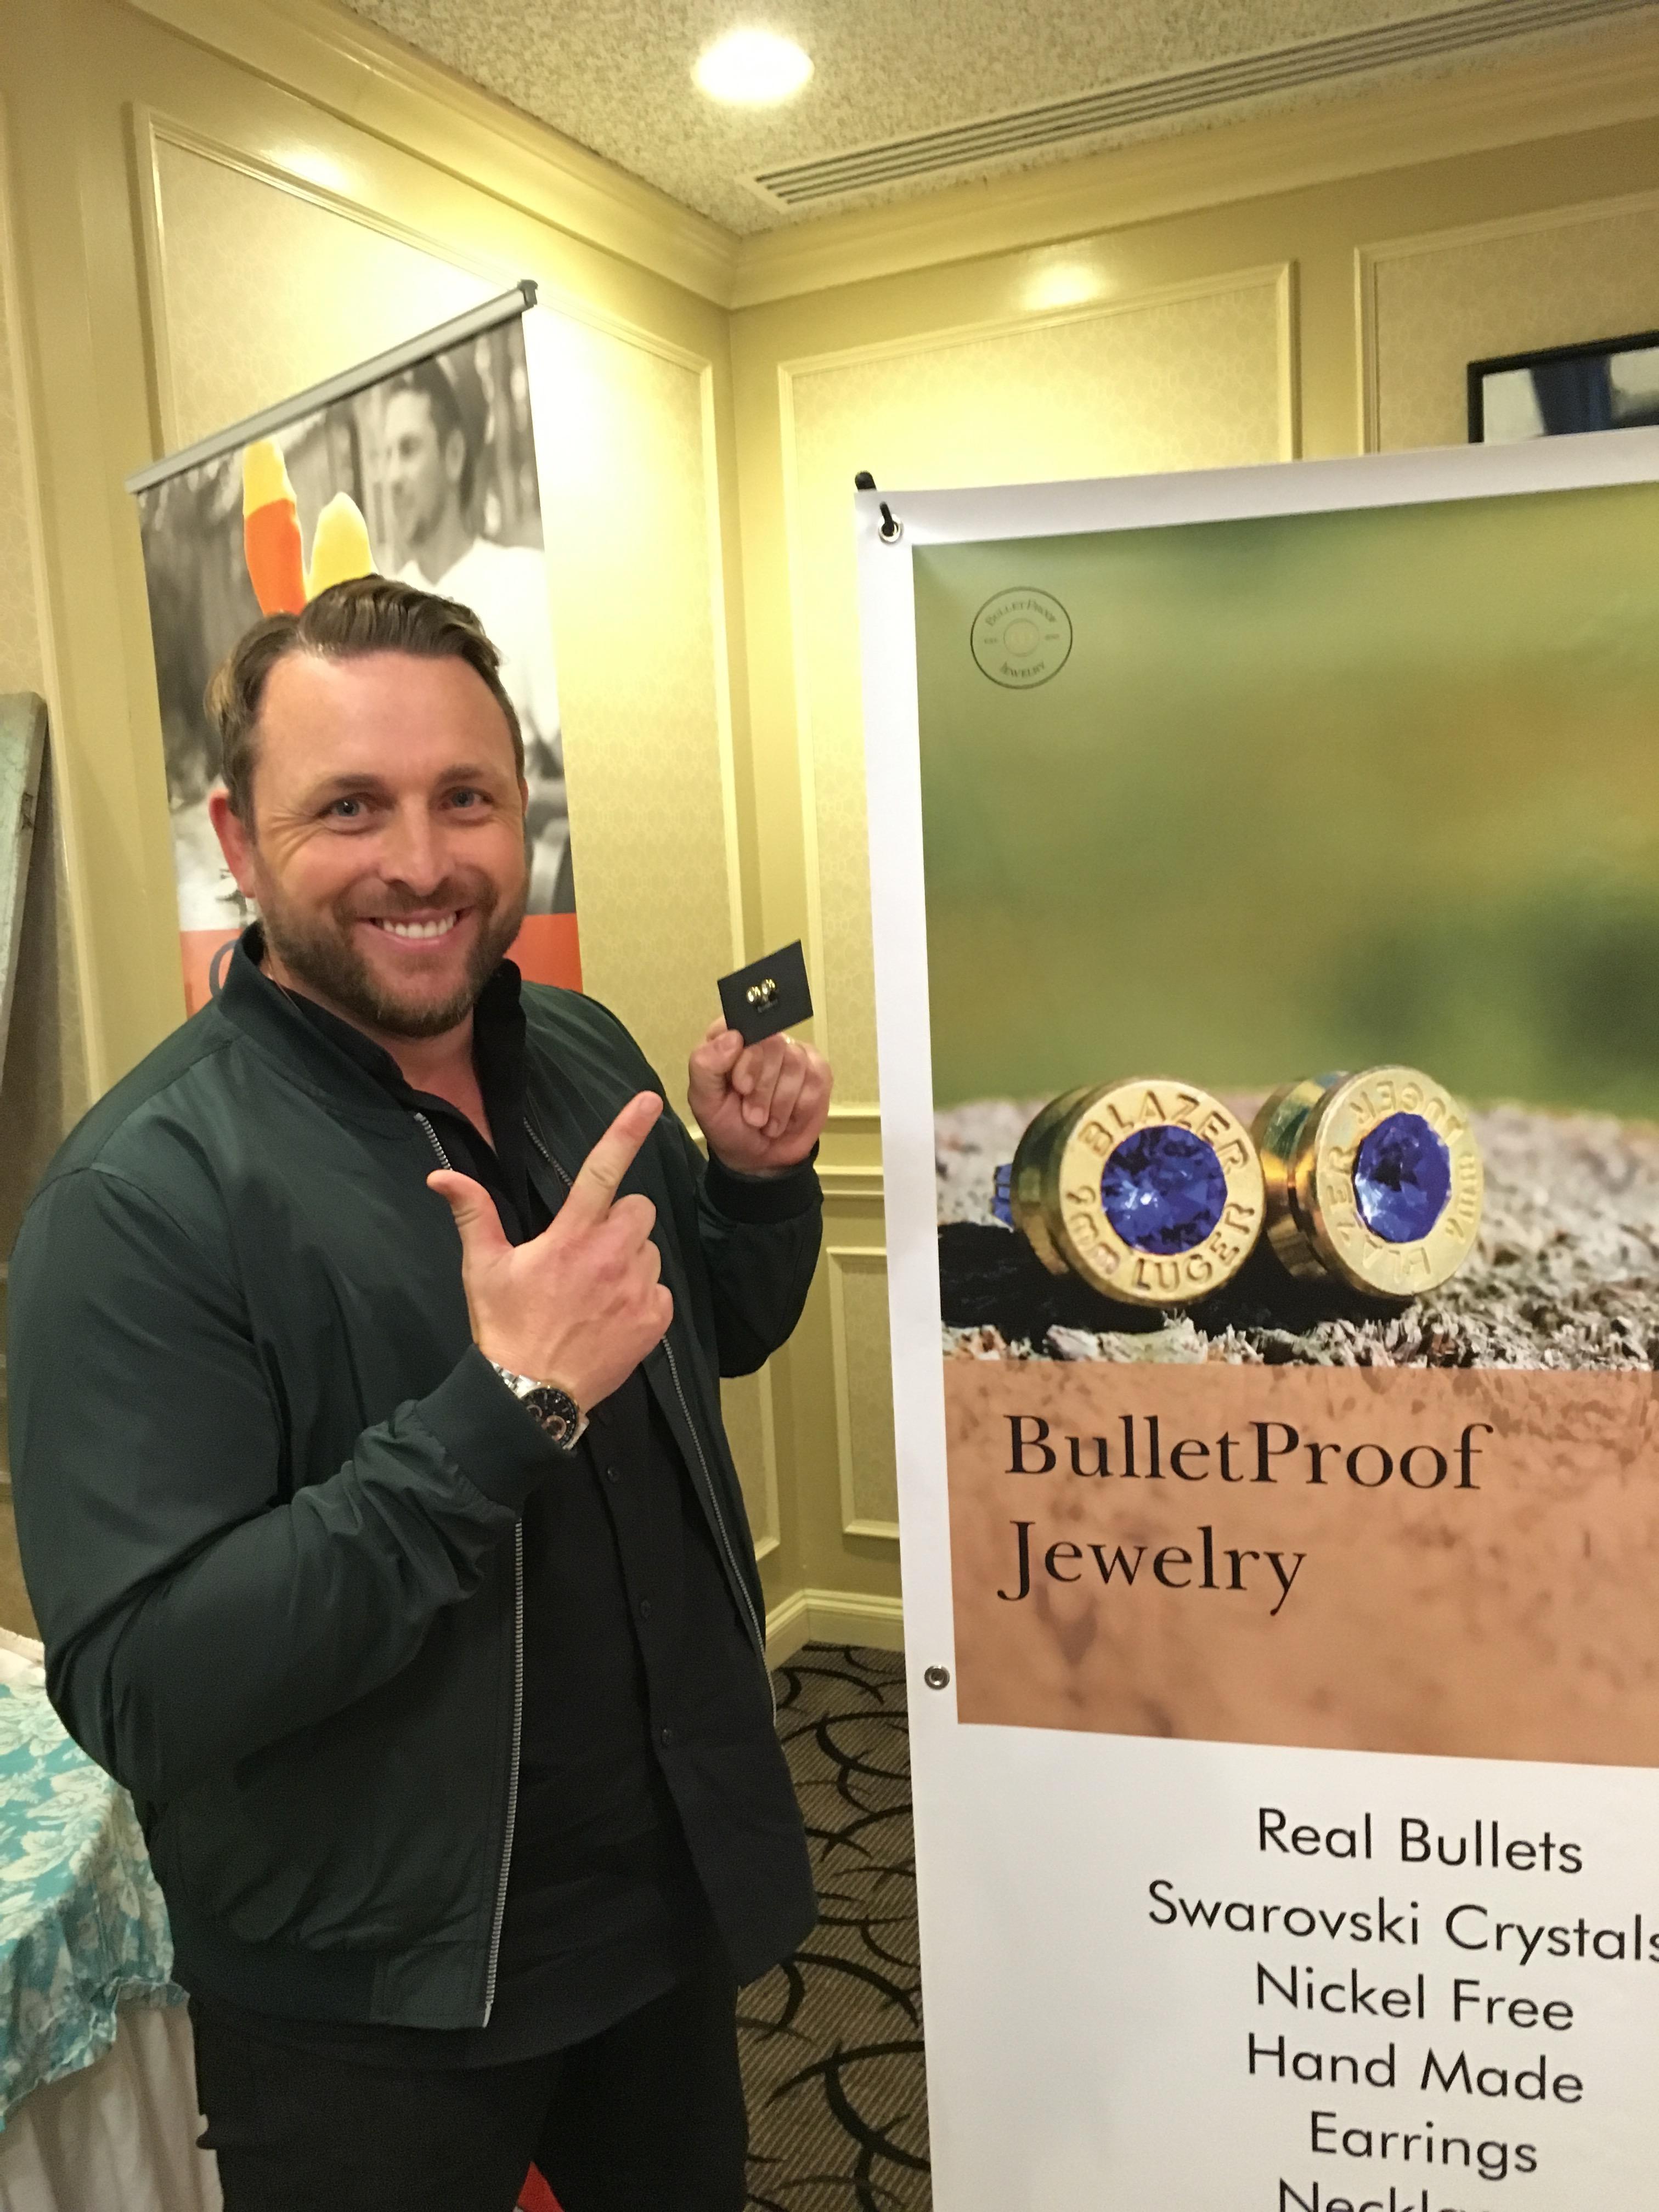 Johnny Reid at the BulletProof Jewelry display